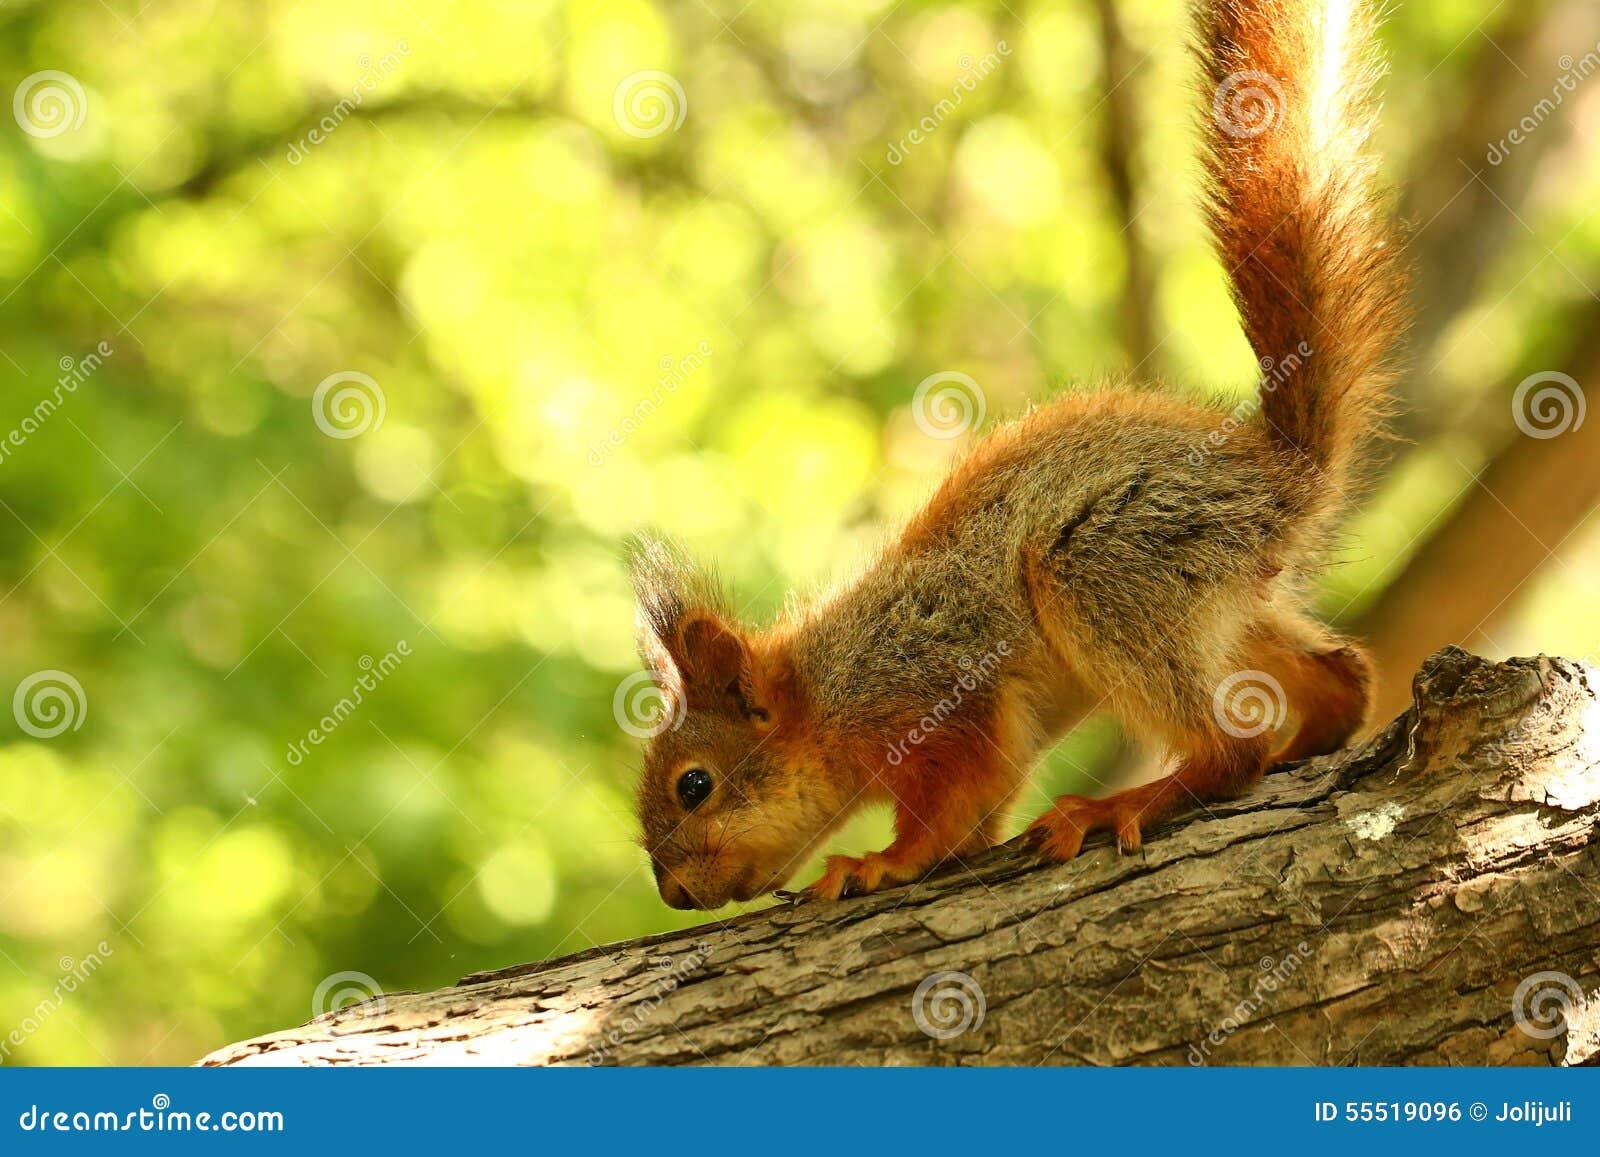 Baby Tree Squirrel